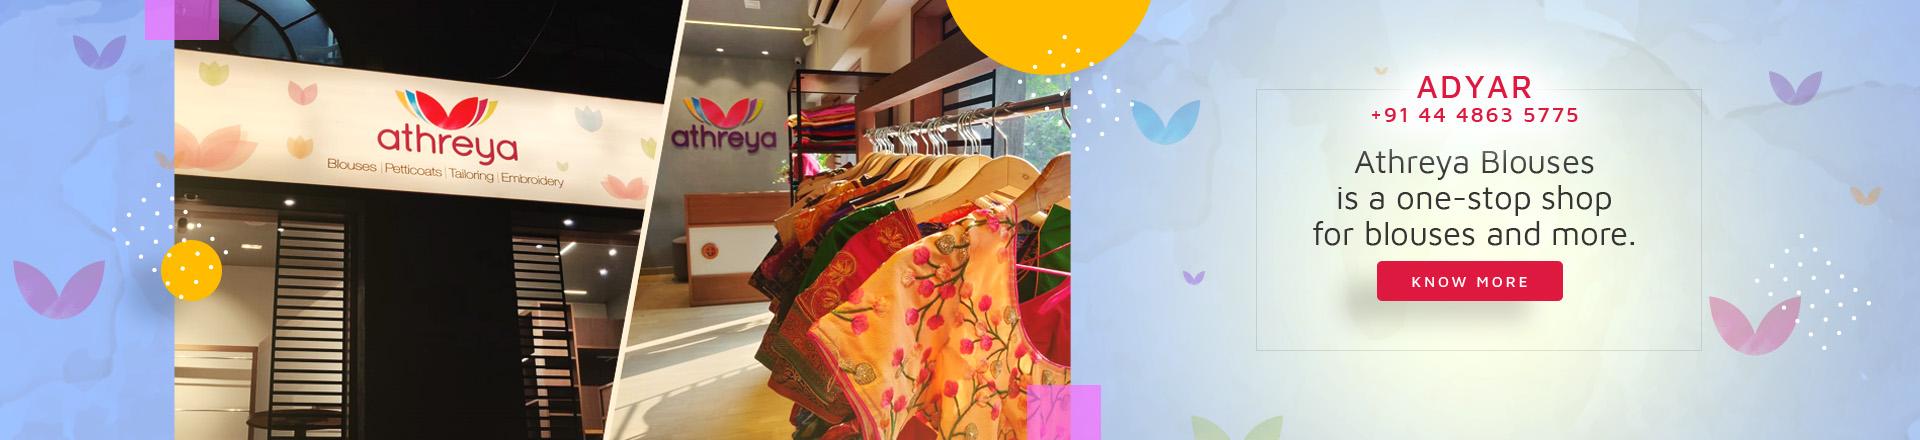 Adyar Shop